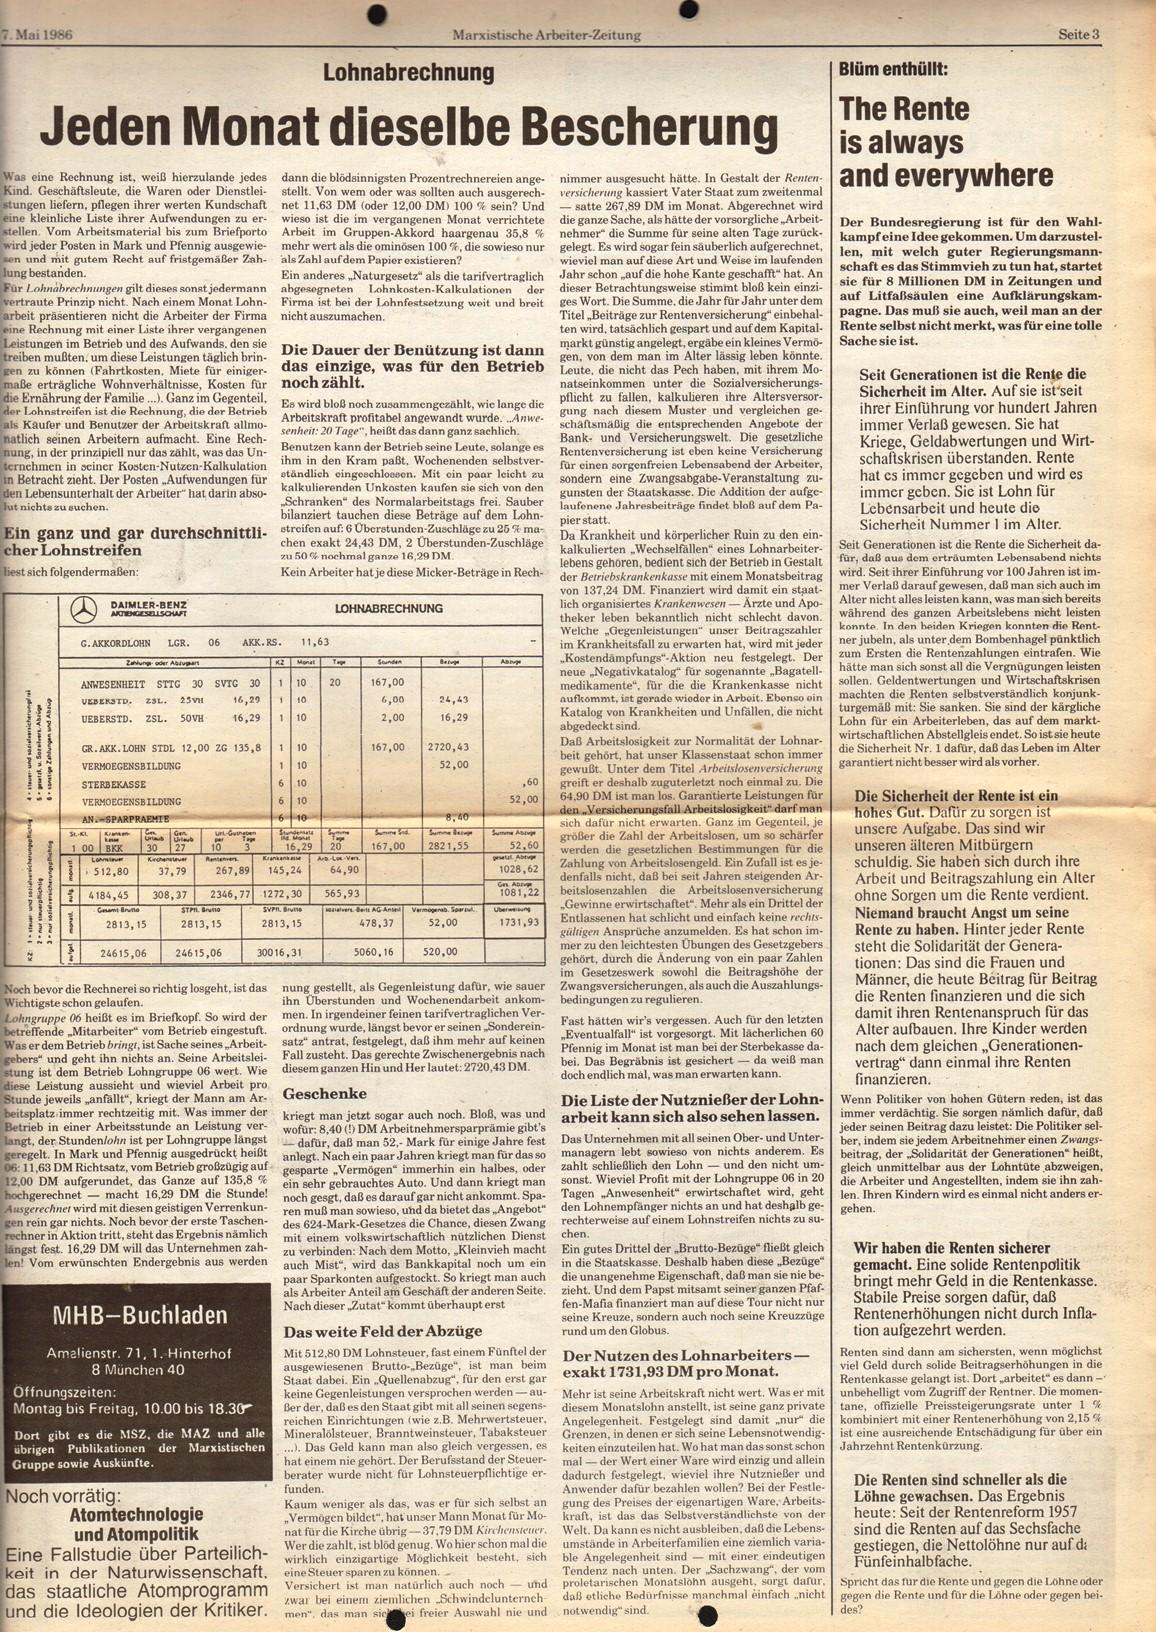 Muenchen_MG_MAZ_AGFA_19860507_03